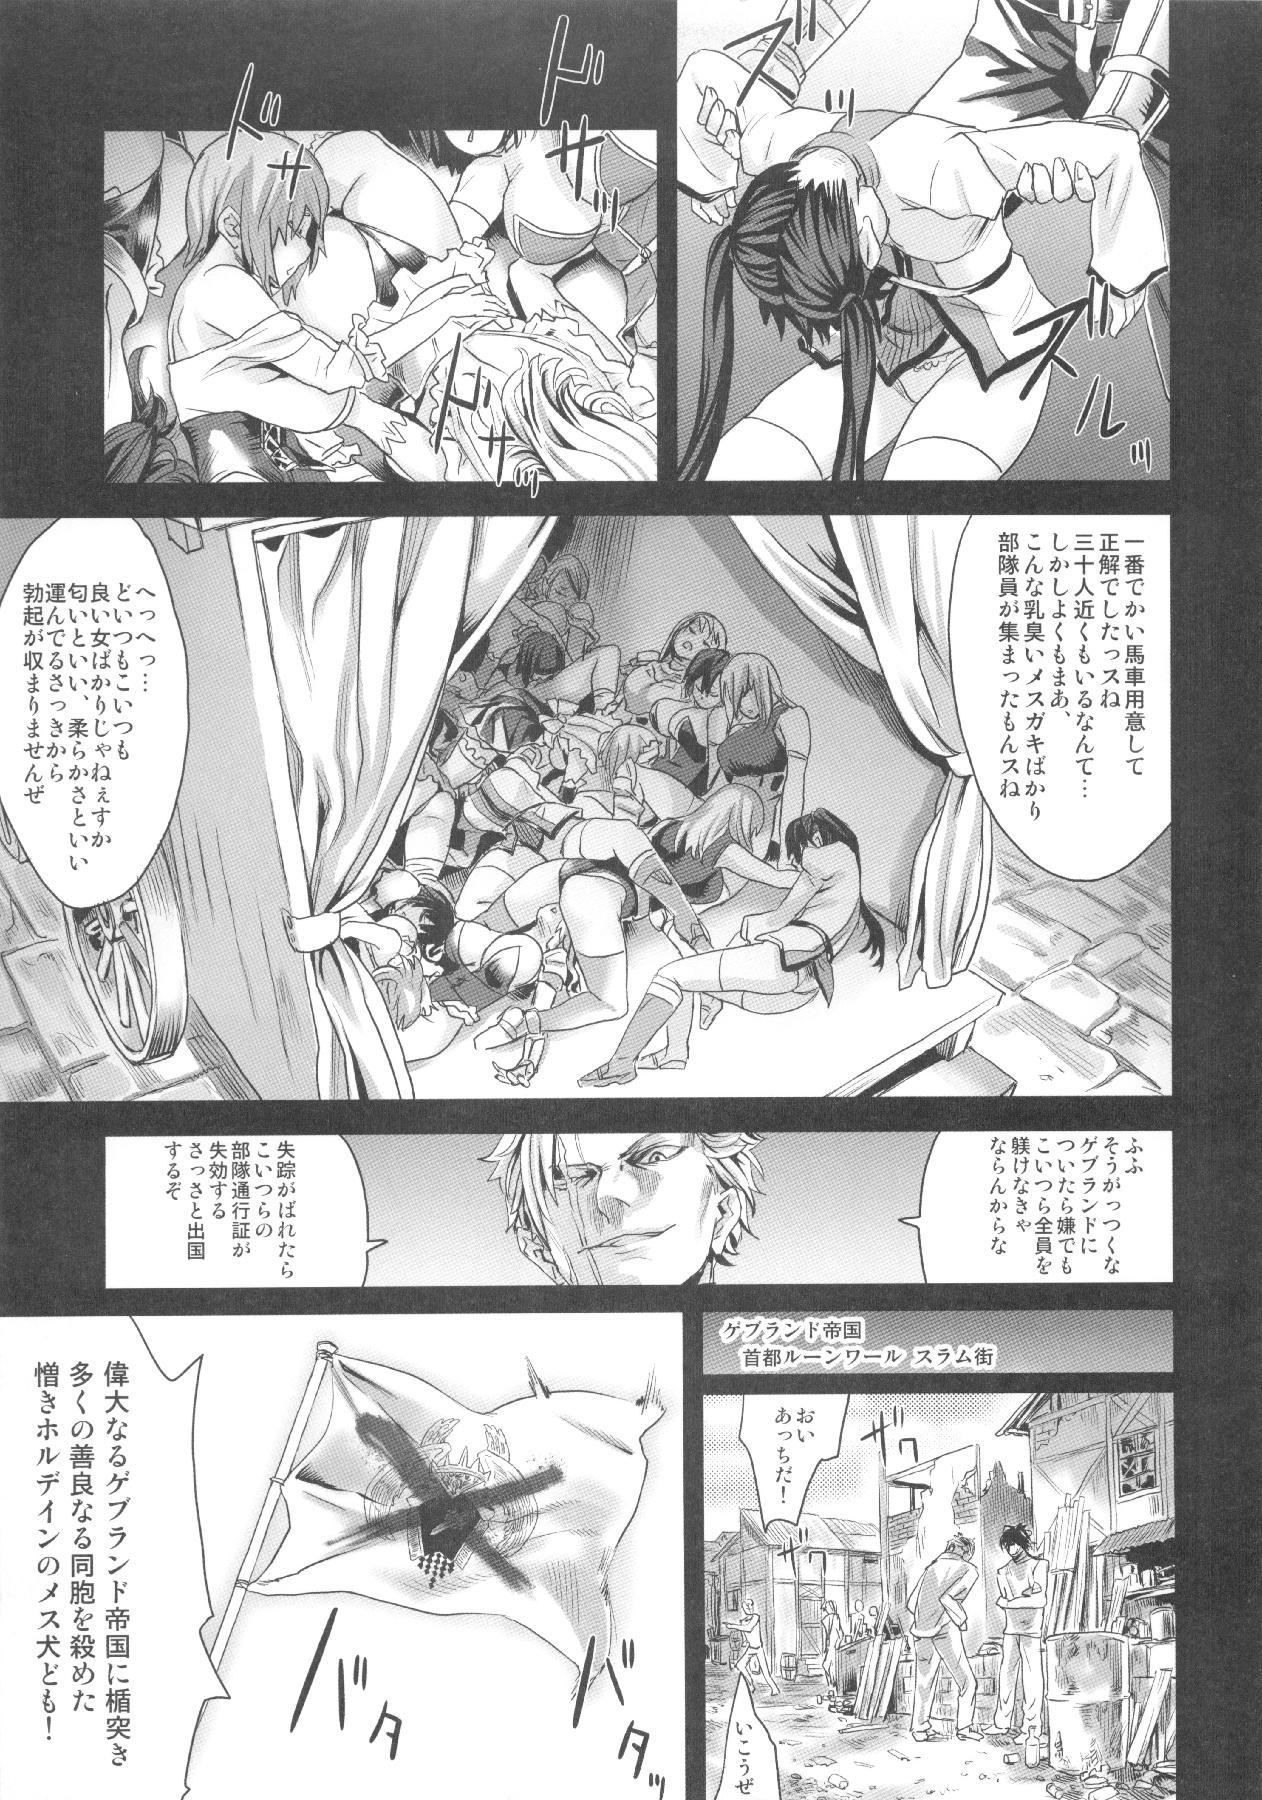 (C83) [Fatalpulse (Asanagi)] VictimGirls Compiled Vol.1 -Victimgirls Soushuuhen 1- MMO Game Selection (Various) 141